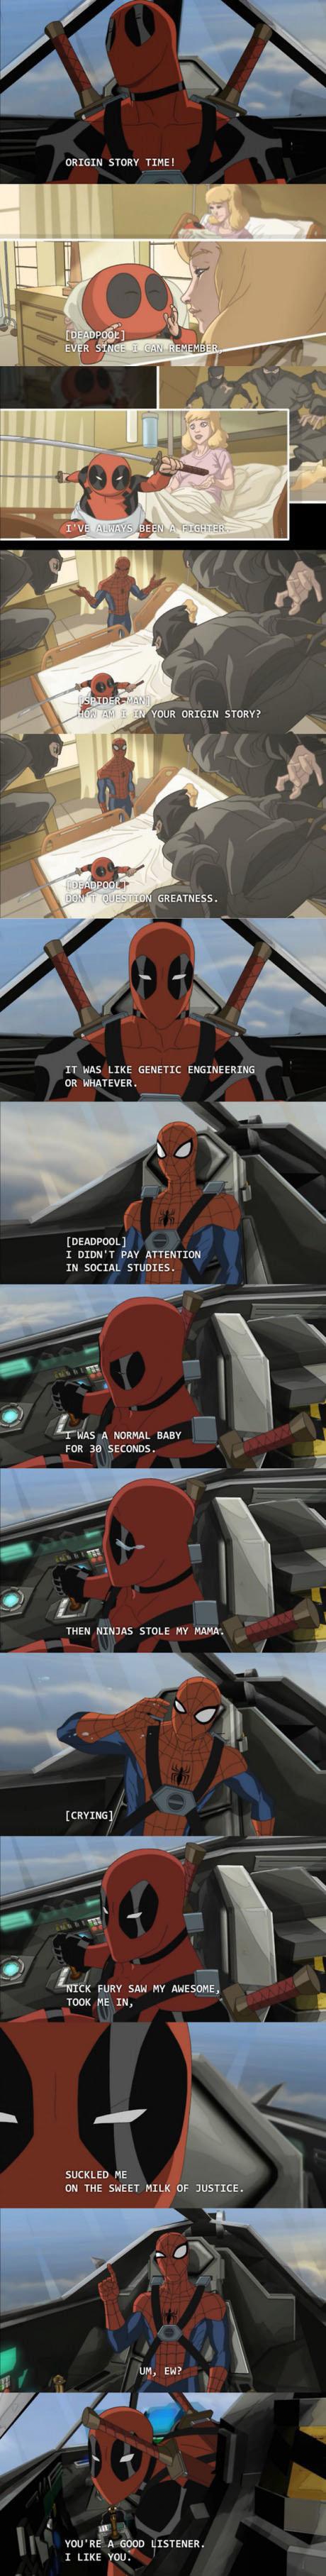 Deadpool Origin Story Time!. Ninjas took mah baby. ORIGIN STORY TIME! IT HAS LIKE GENETIC ENGINEERING OR WWHATEVER, DEADPOLL] I DIDN' T PAY ATTENTION . IN ADERA Deadpool Spiderman origin story Marvel